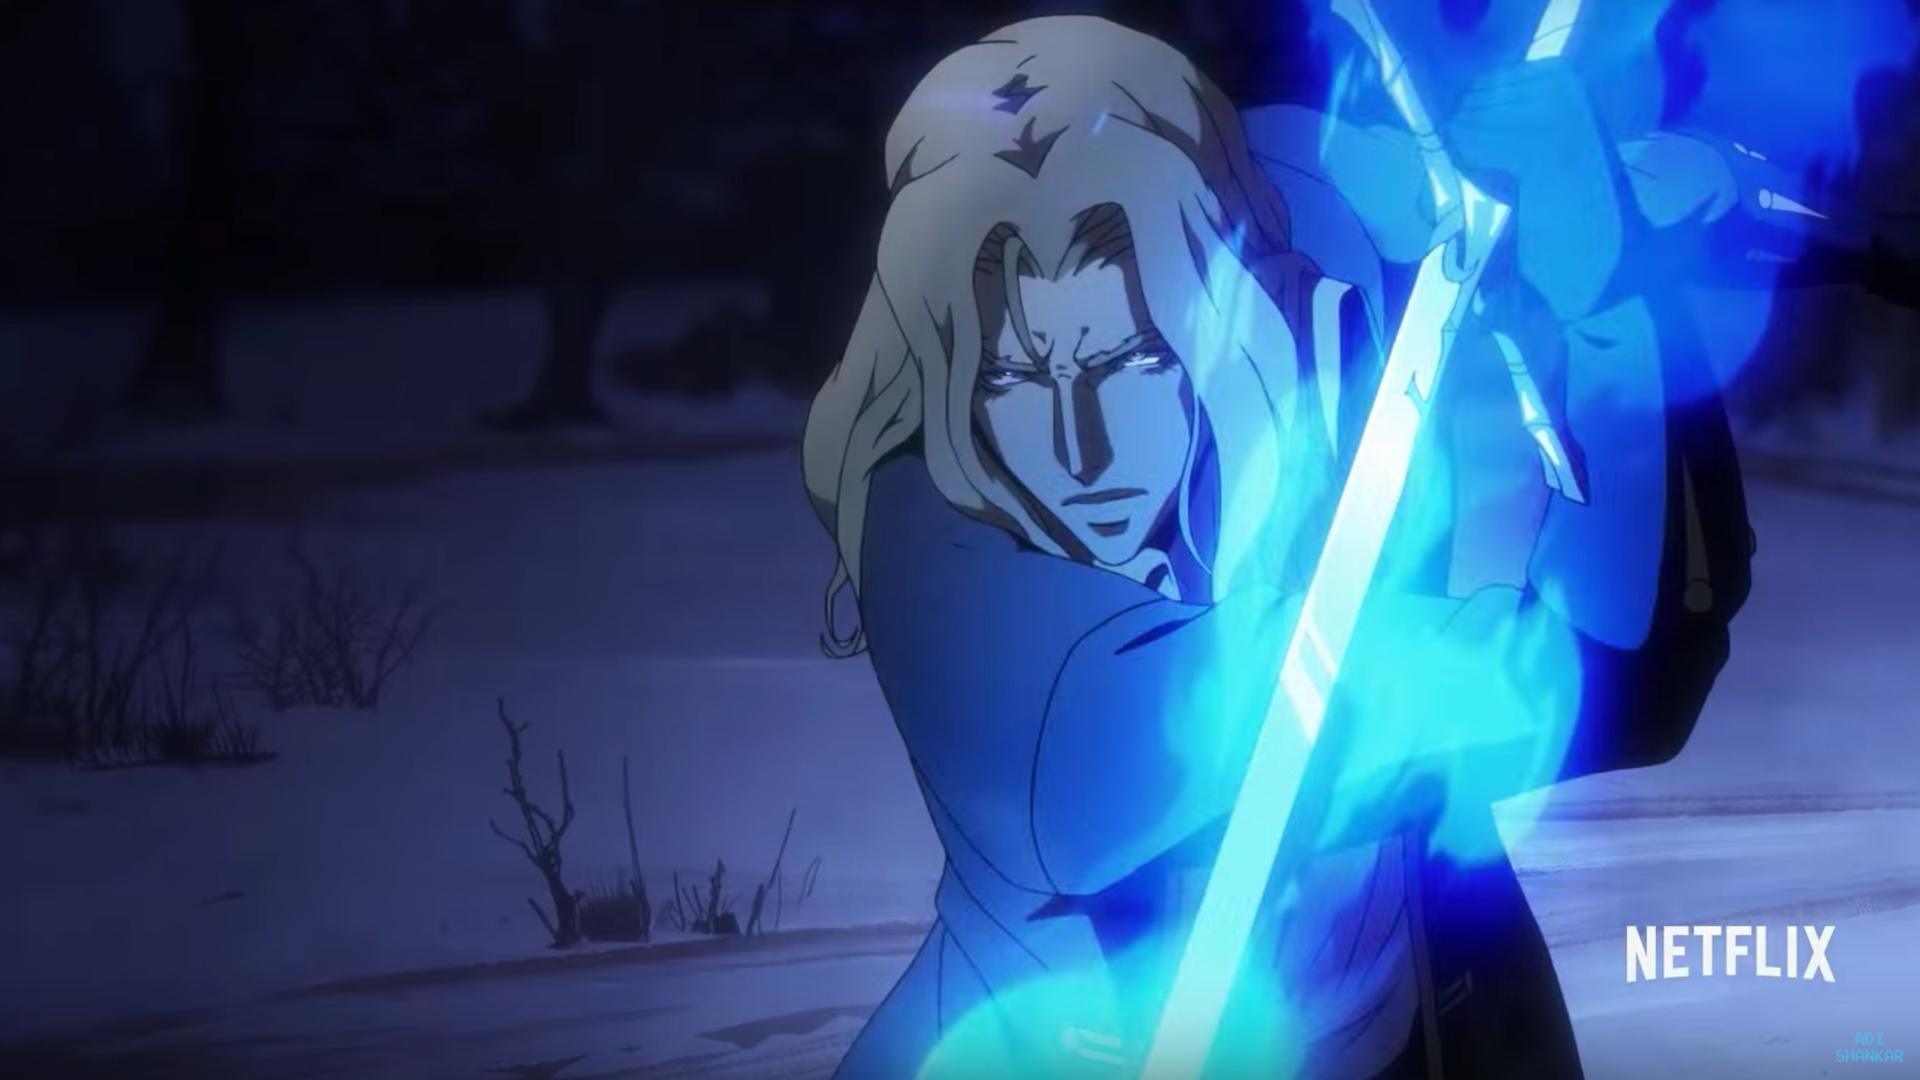 Castlevania' Season 3 Release Date, Plot, Villain, and